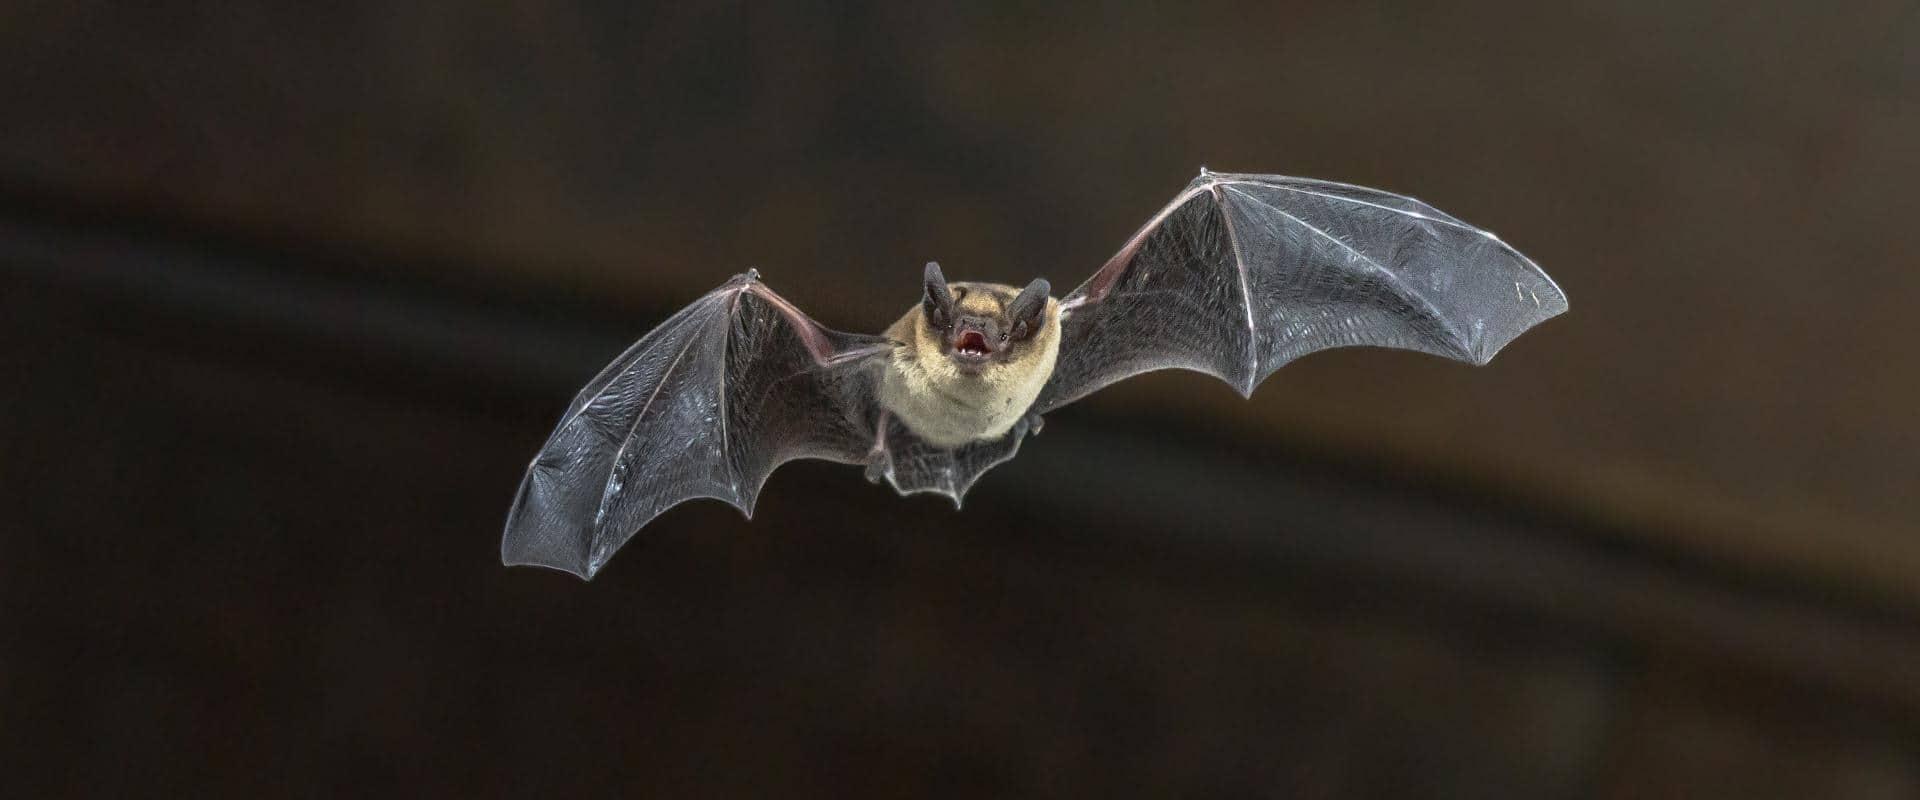 bat flying through air in central washington